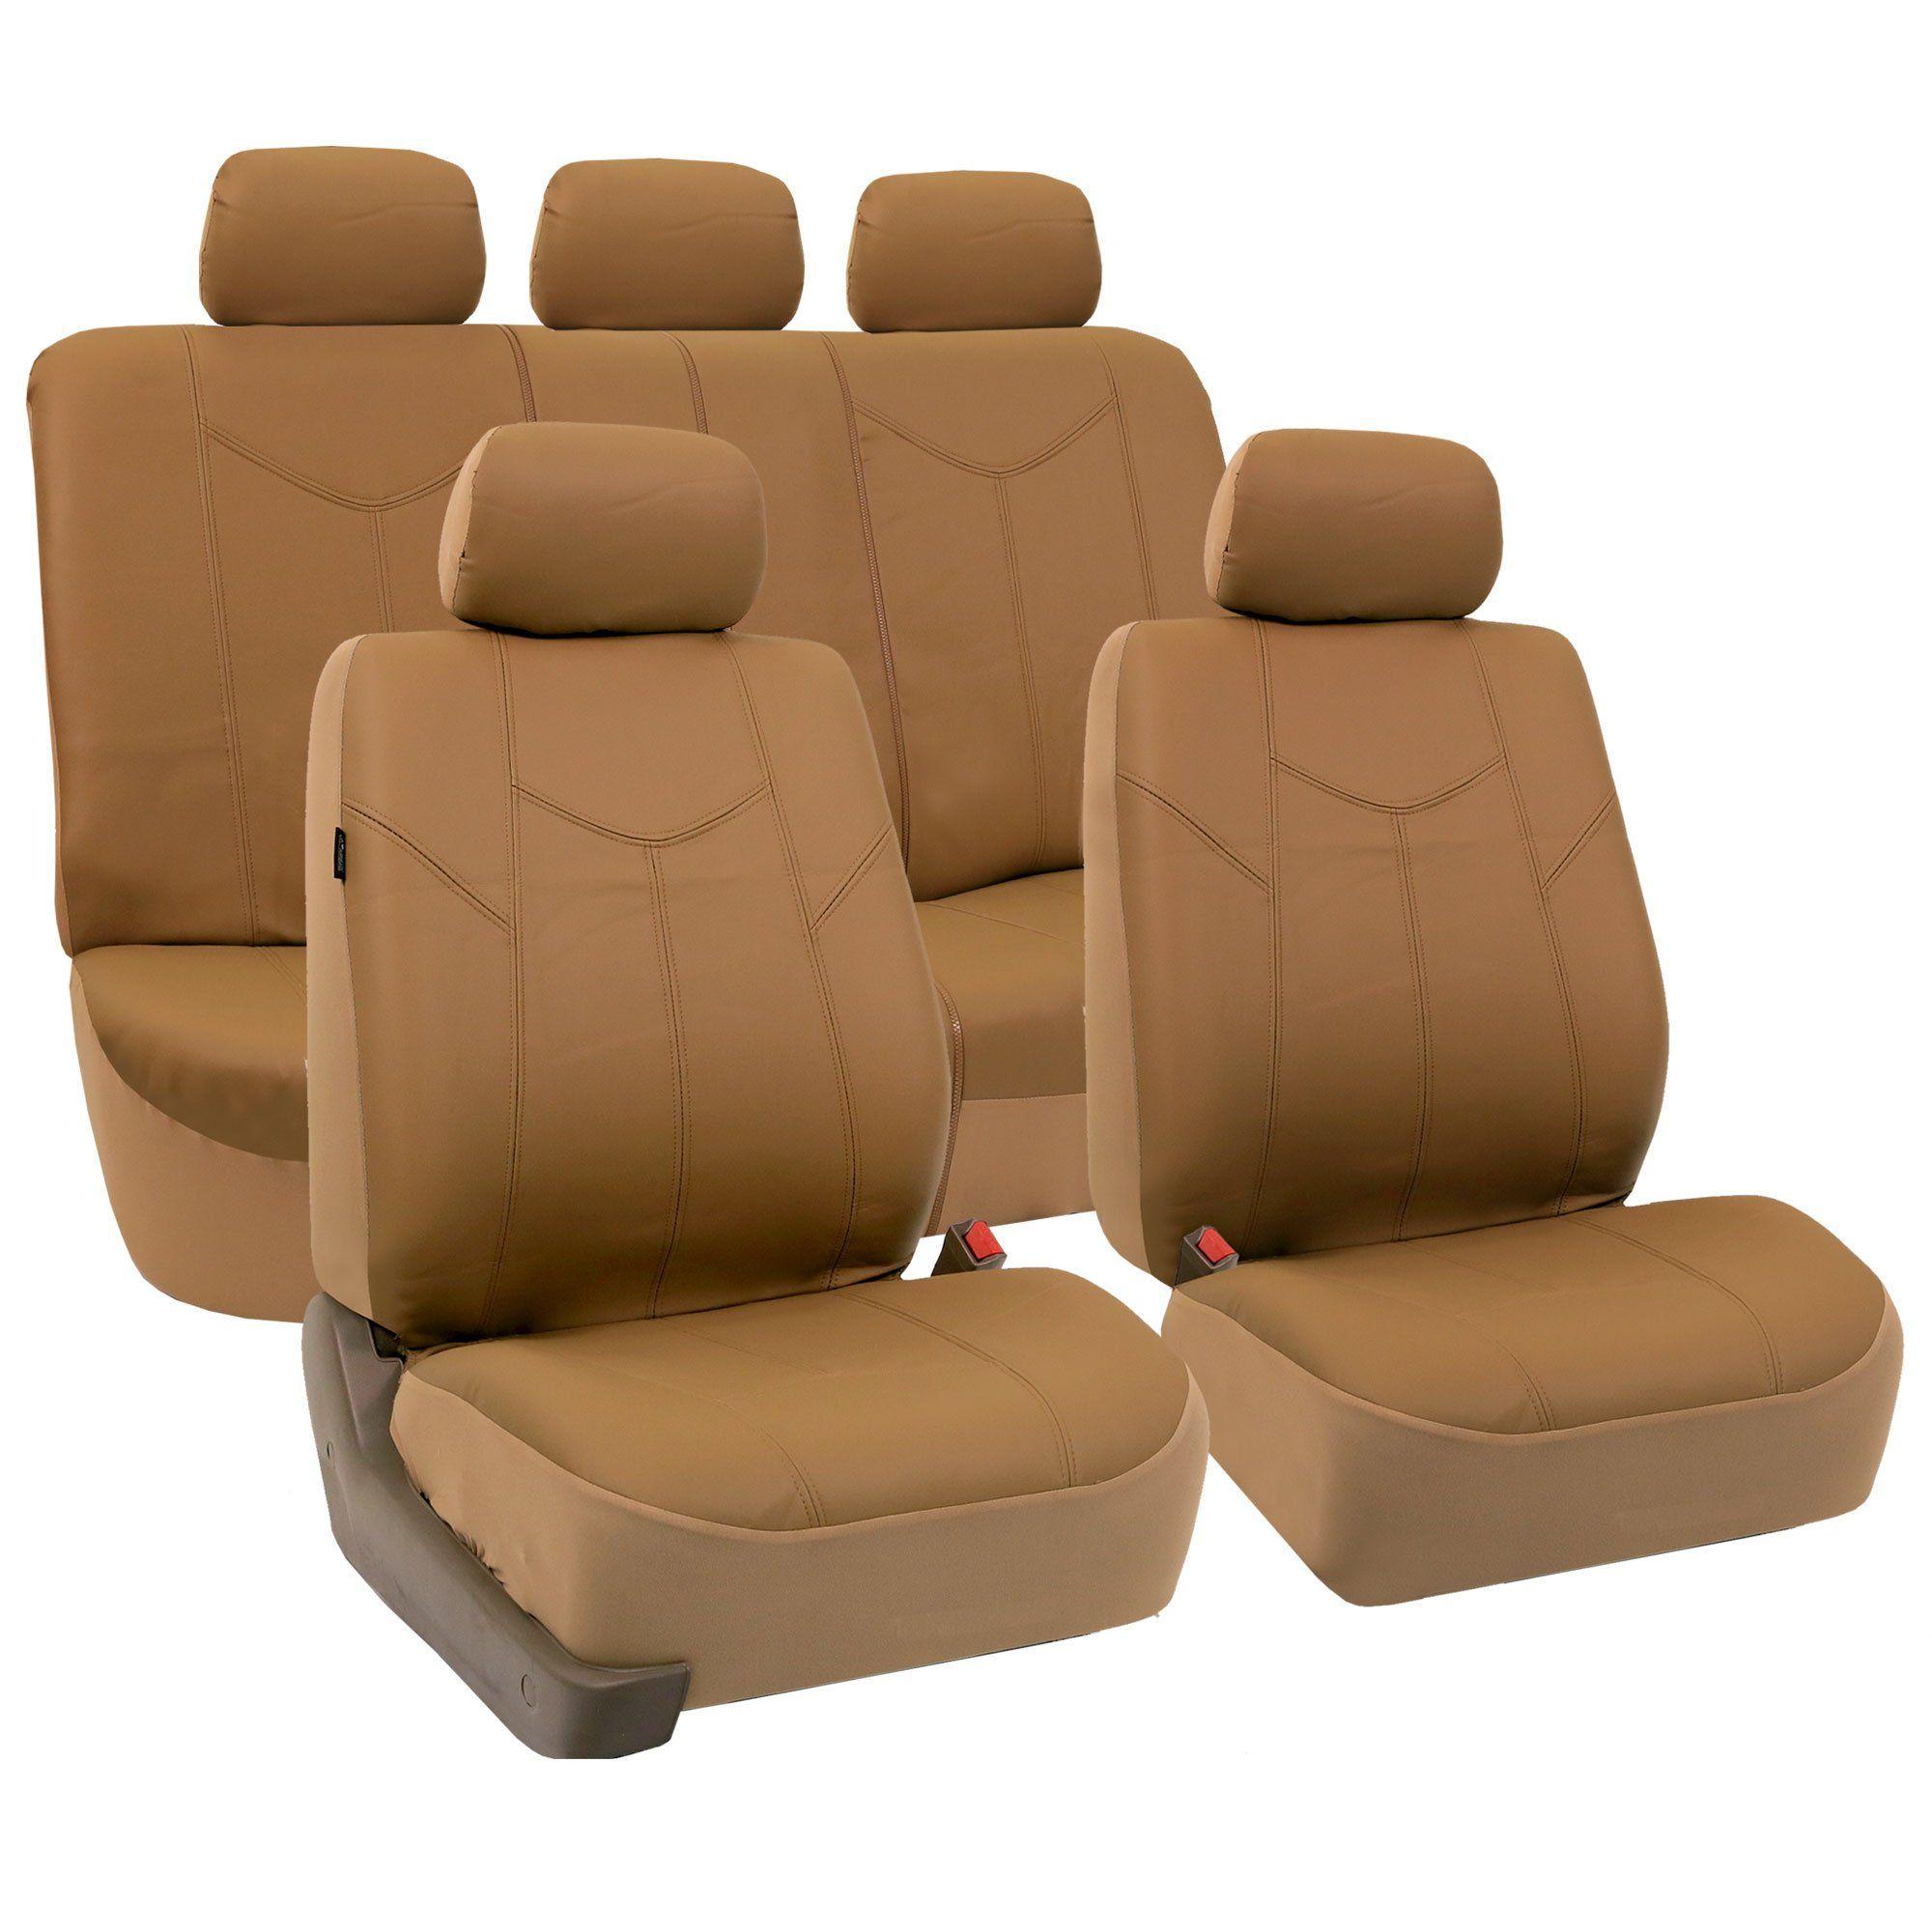 FHPU009115 Rome PU Leather Seat Covers Airbag Ready